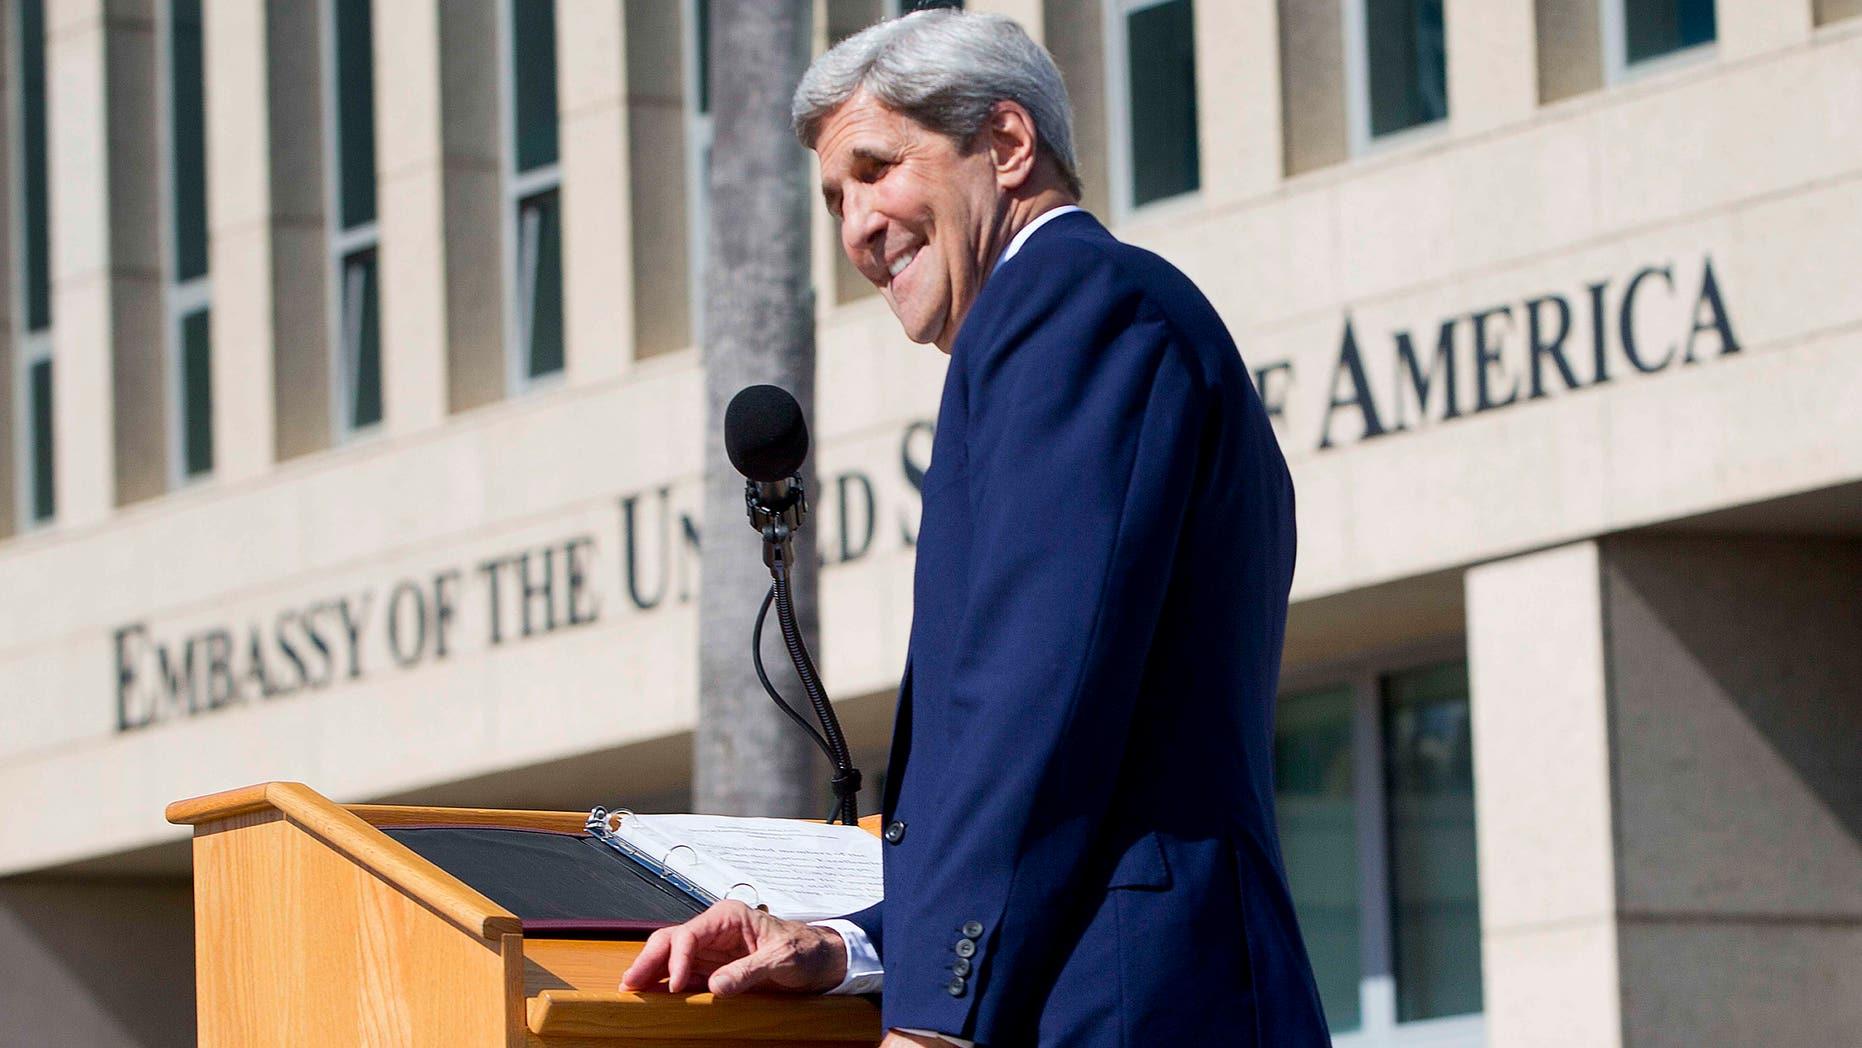 Secretary Kerry at the newly reopened embassy in Havana, Cuba. Friday, Aug. 14, 2015.